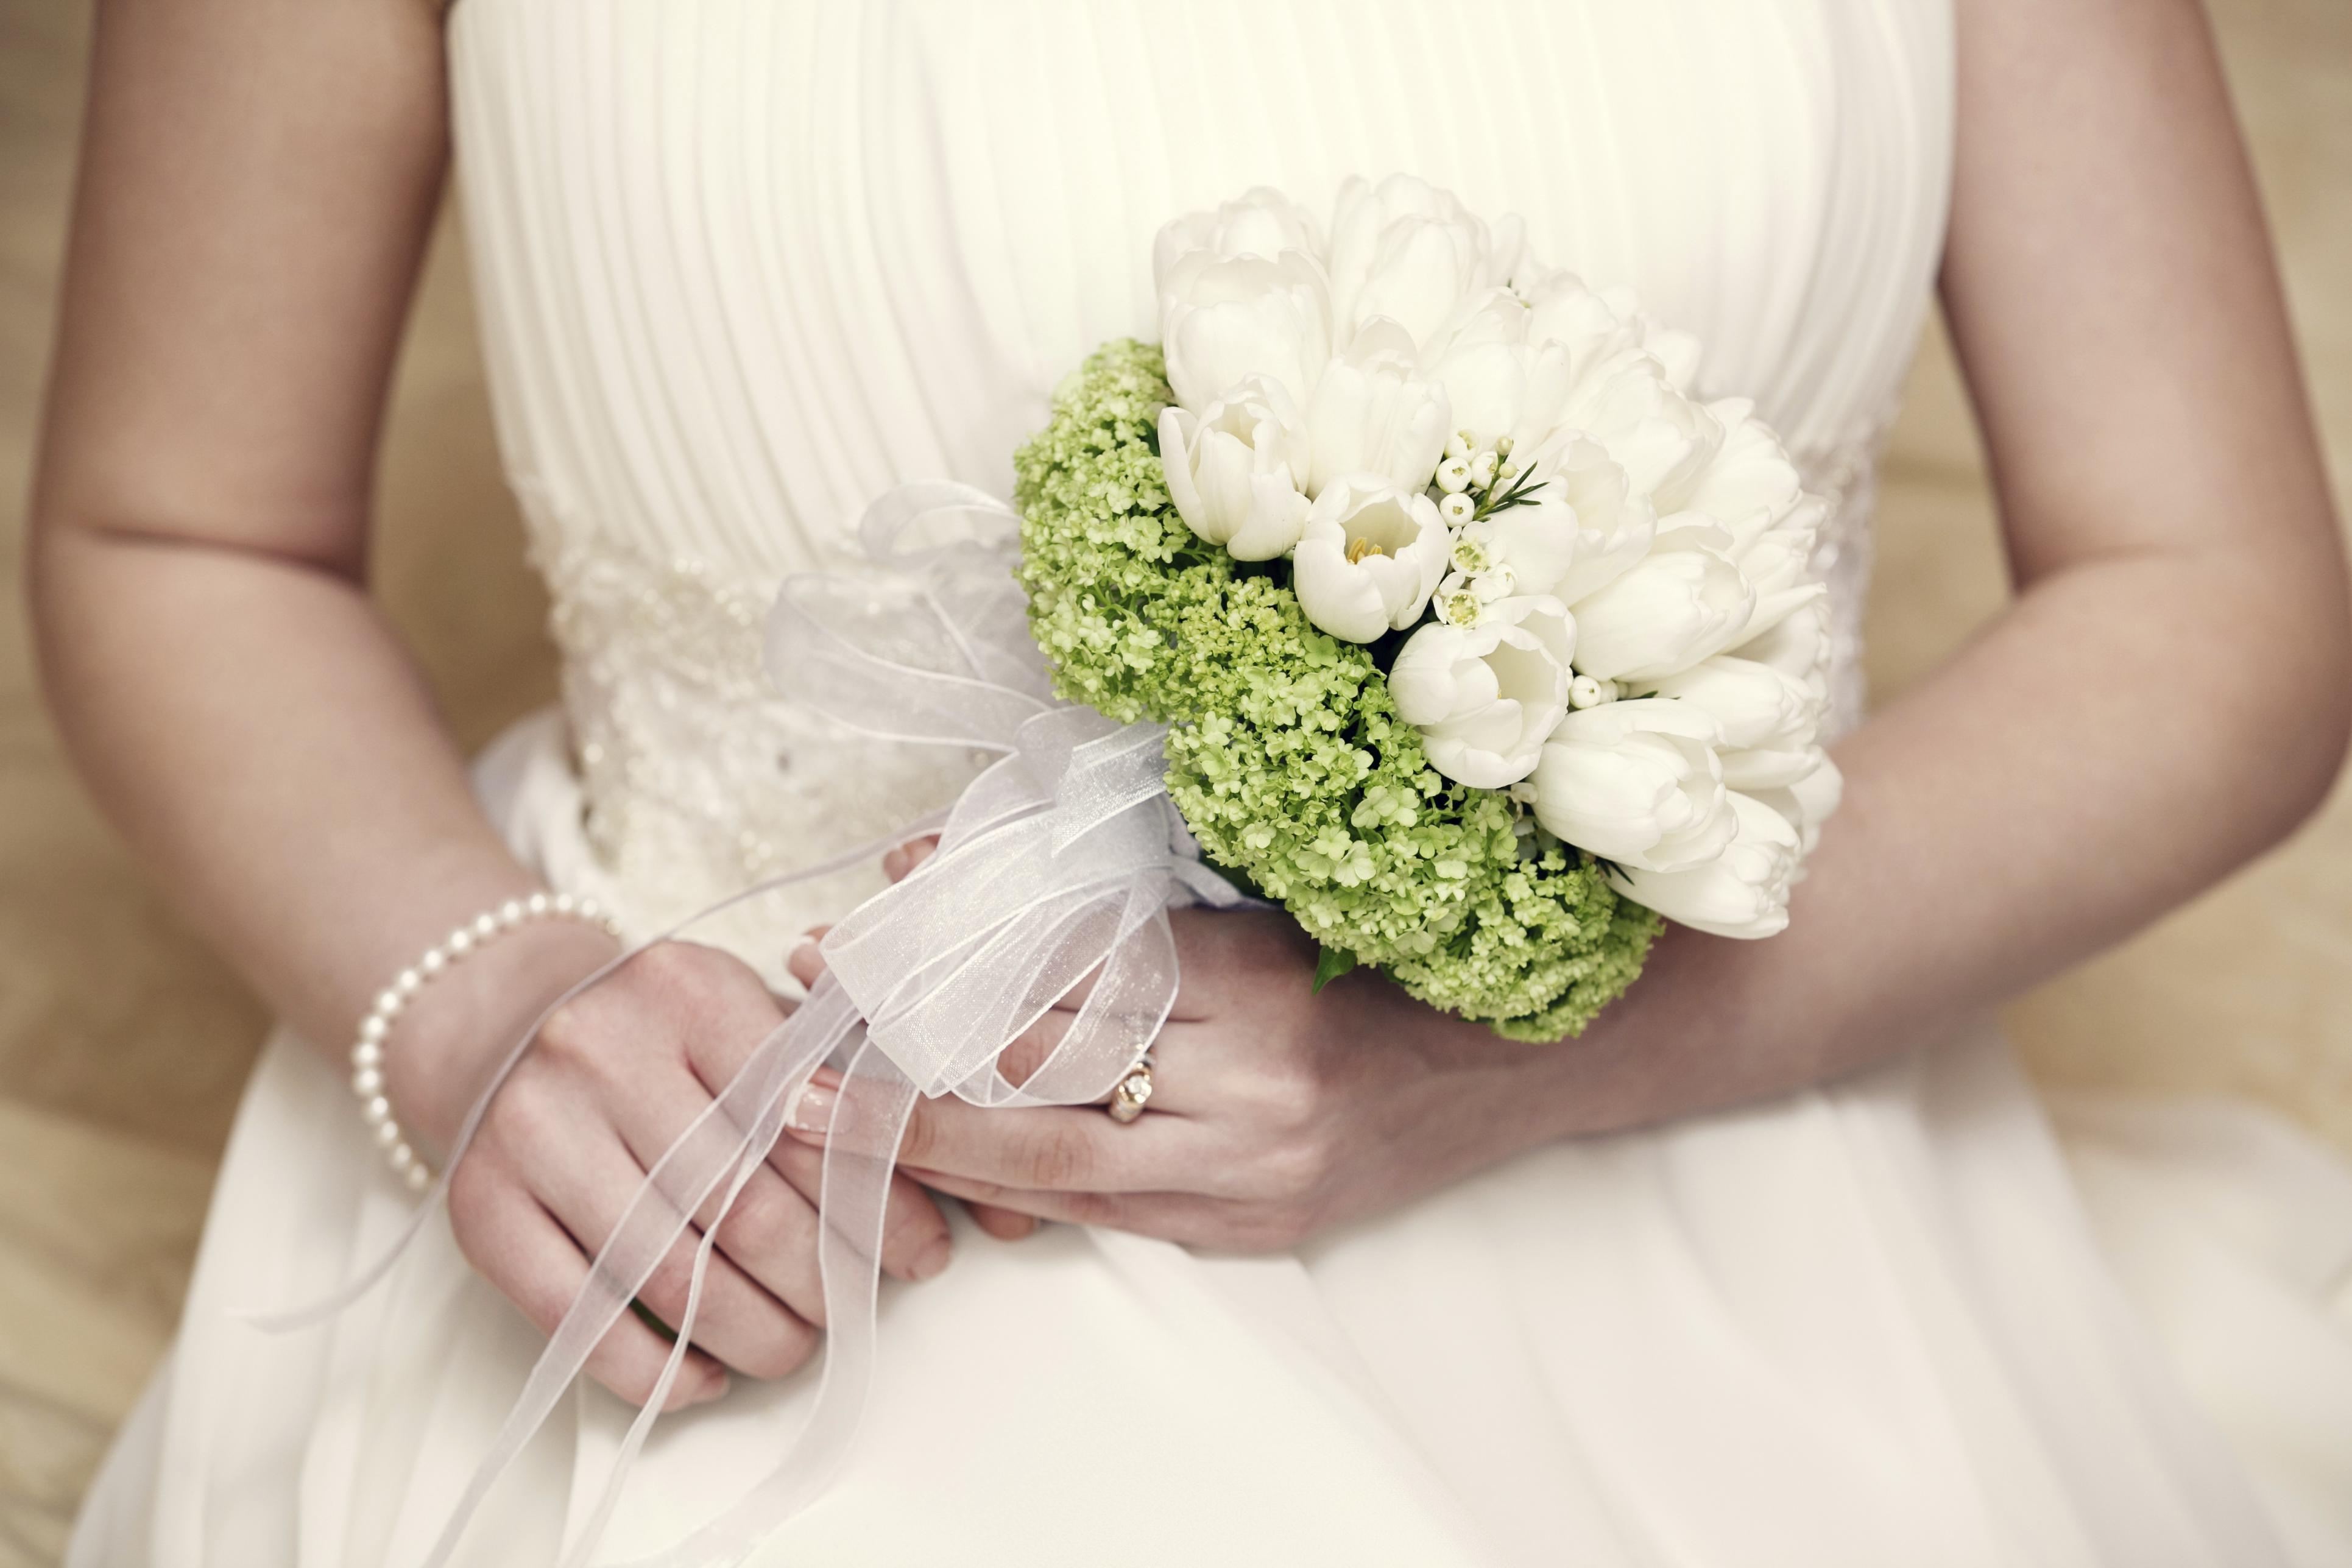 White Themed Weddings - White Wedding Ideas - Easy Weddings